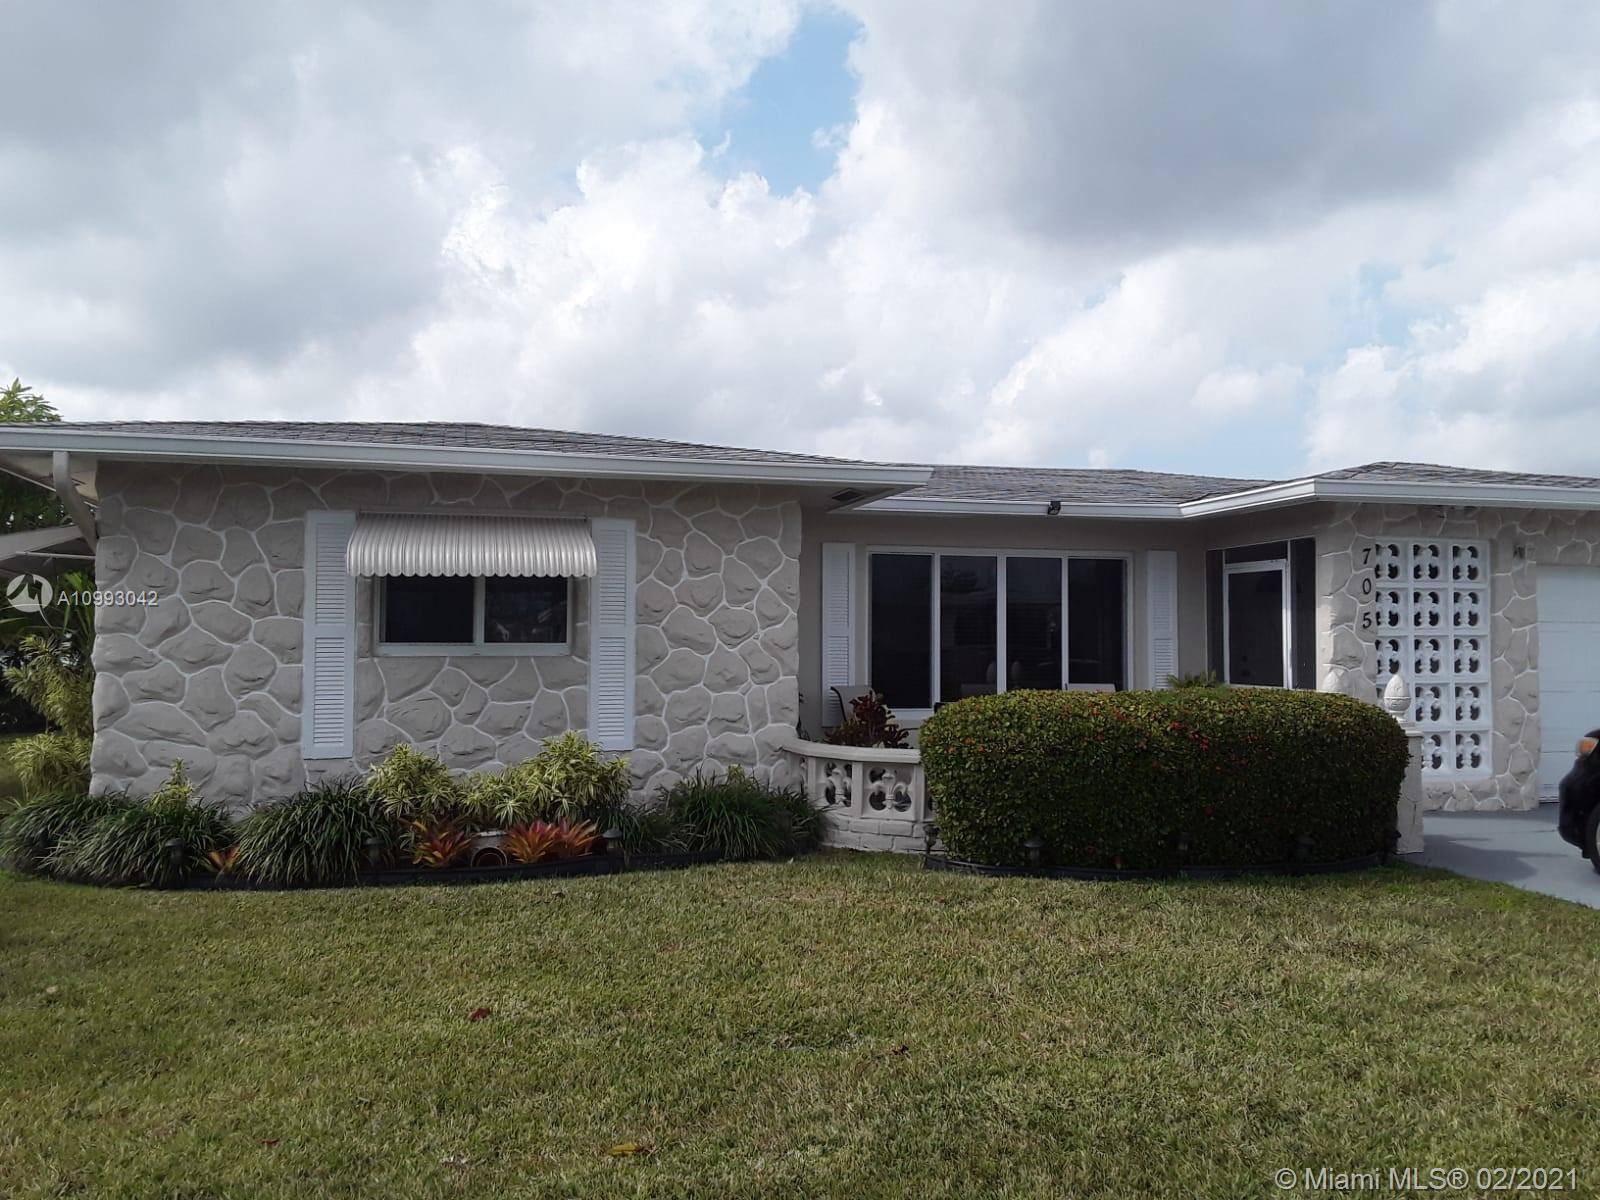 705 NW 73rd Terrace, Margate, FL 33063 - #: A10993042